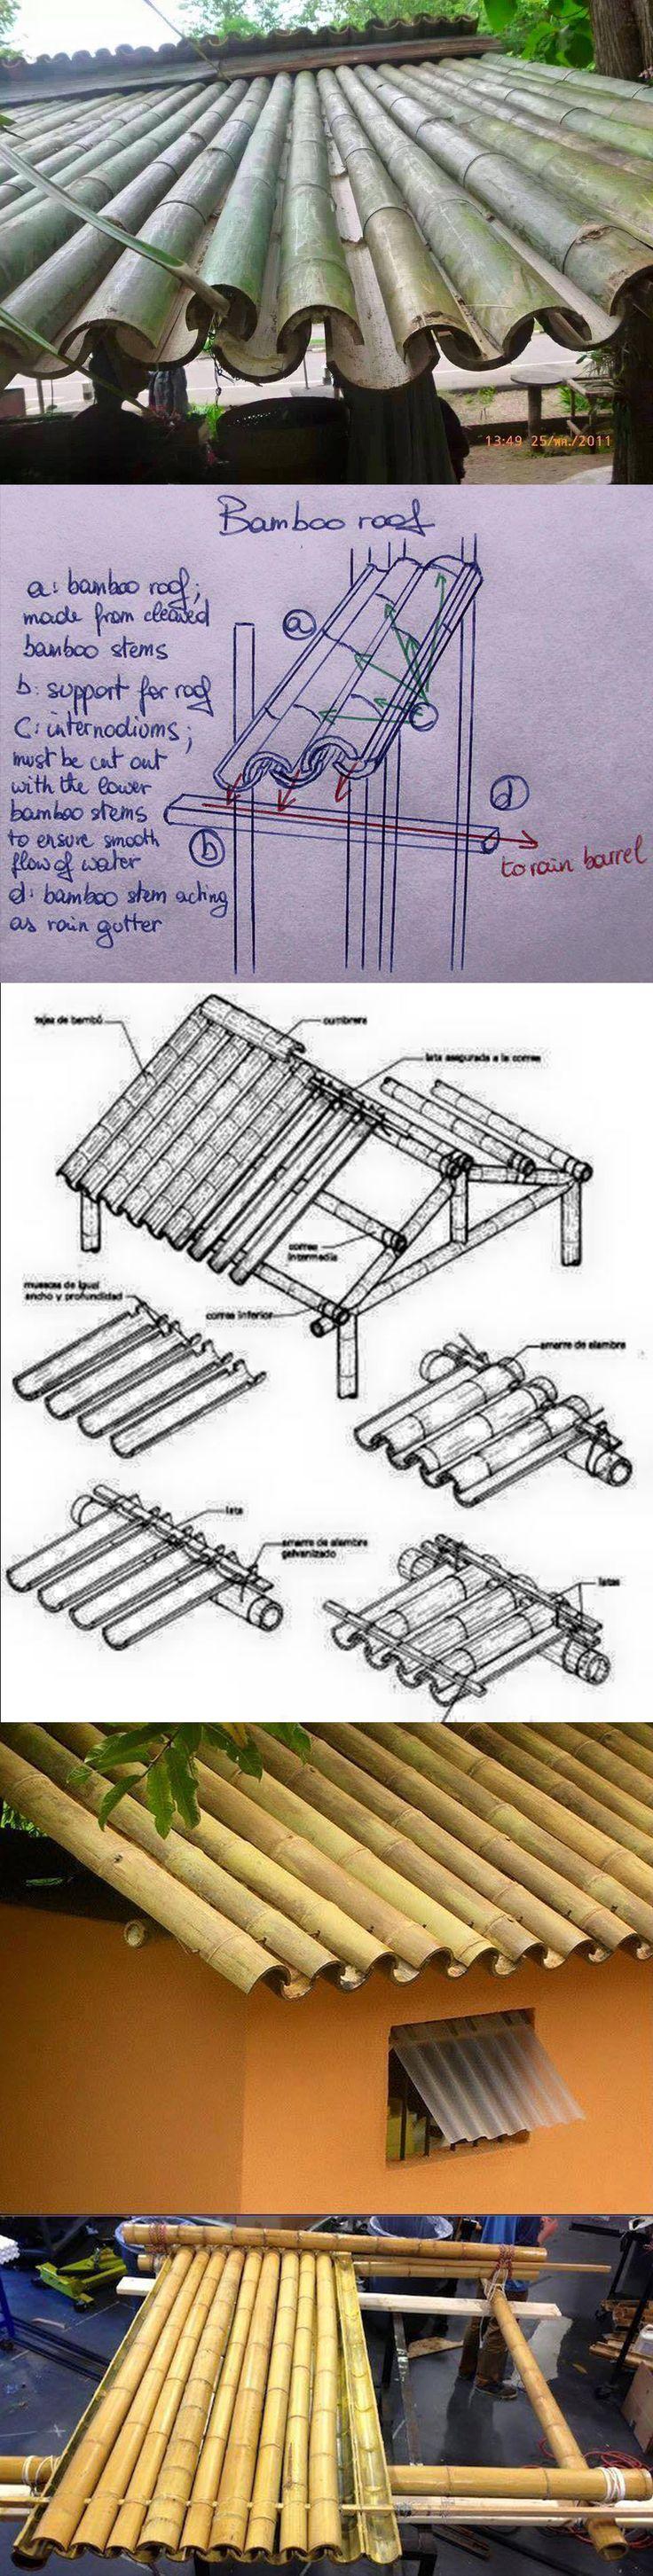 Telhado de bambu/Bamboo Roof